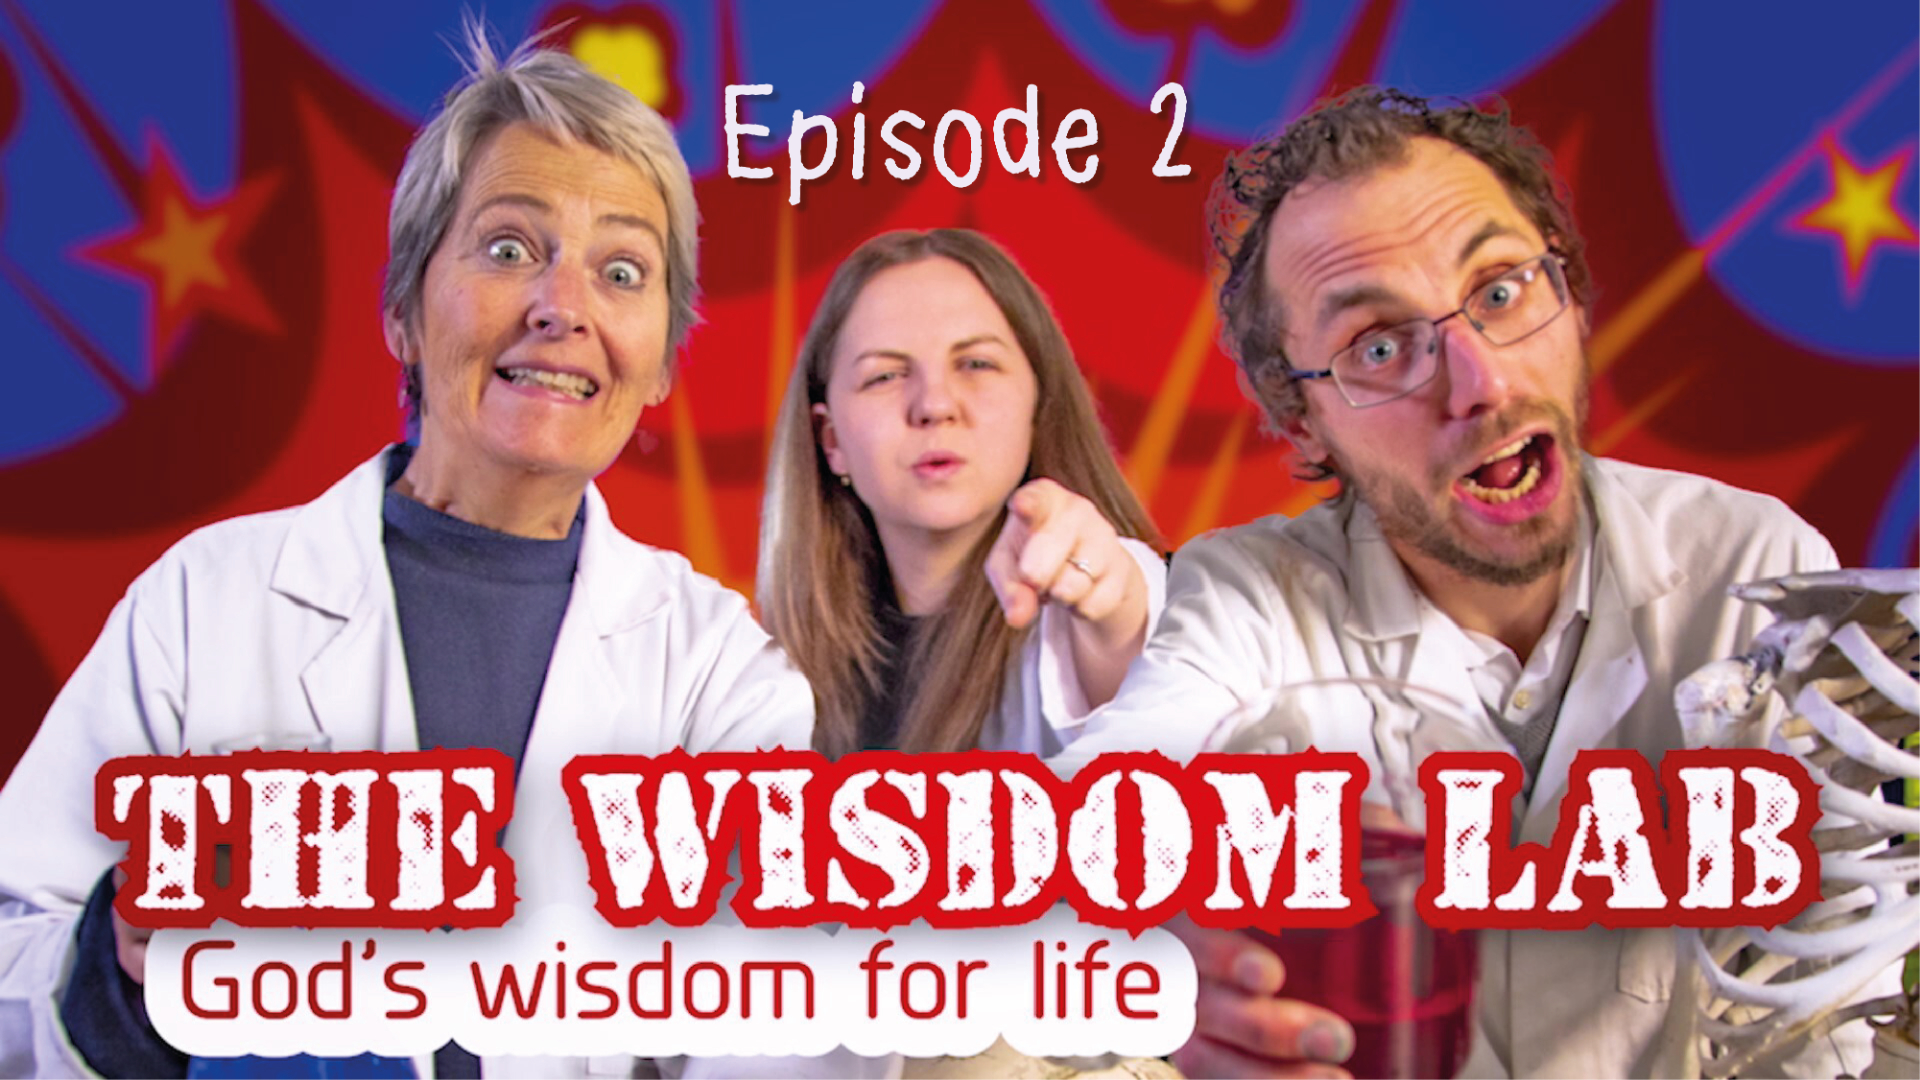 The Wisdom Lab: Episode 2